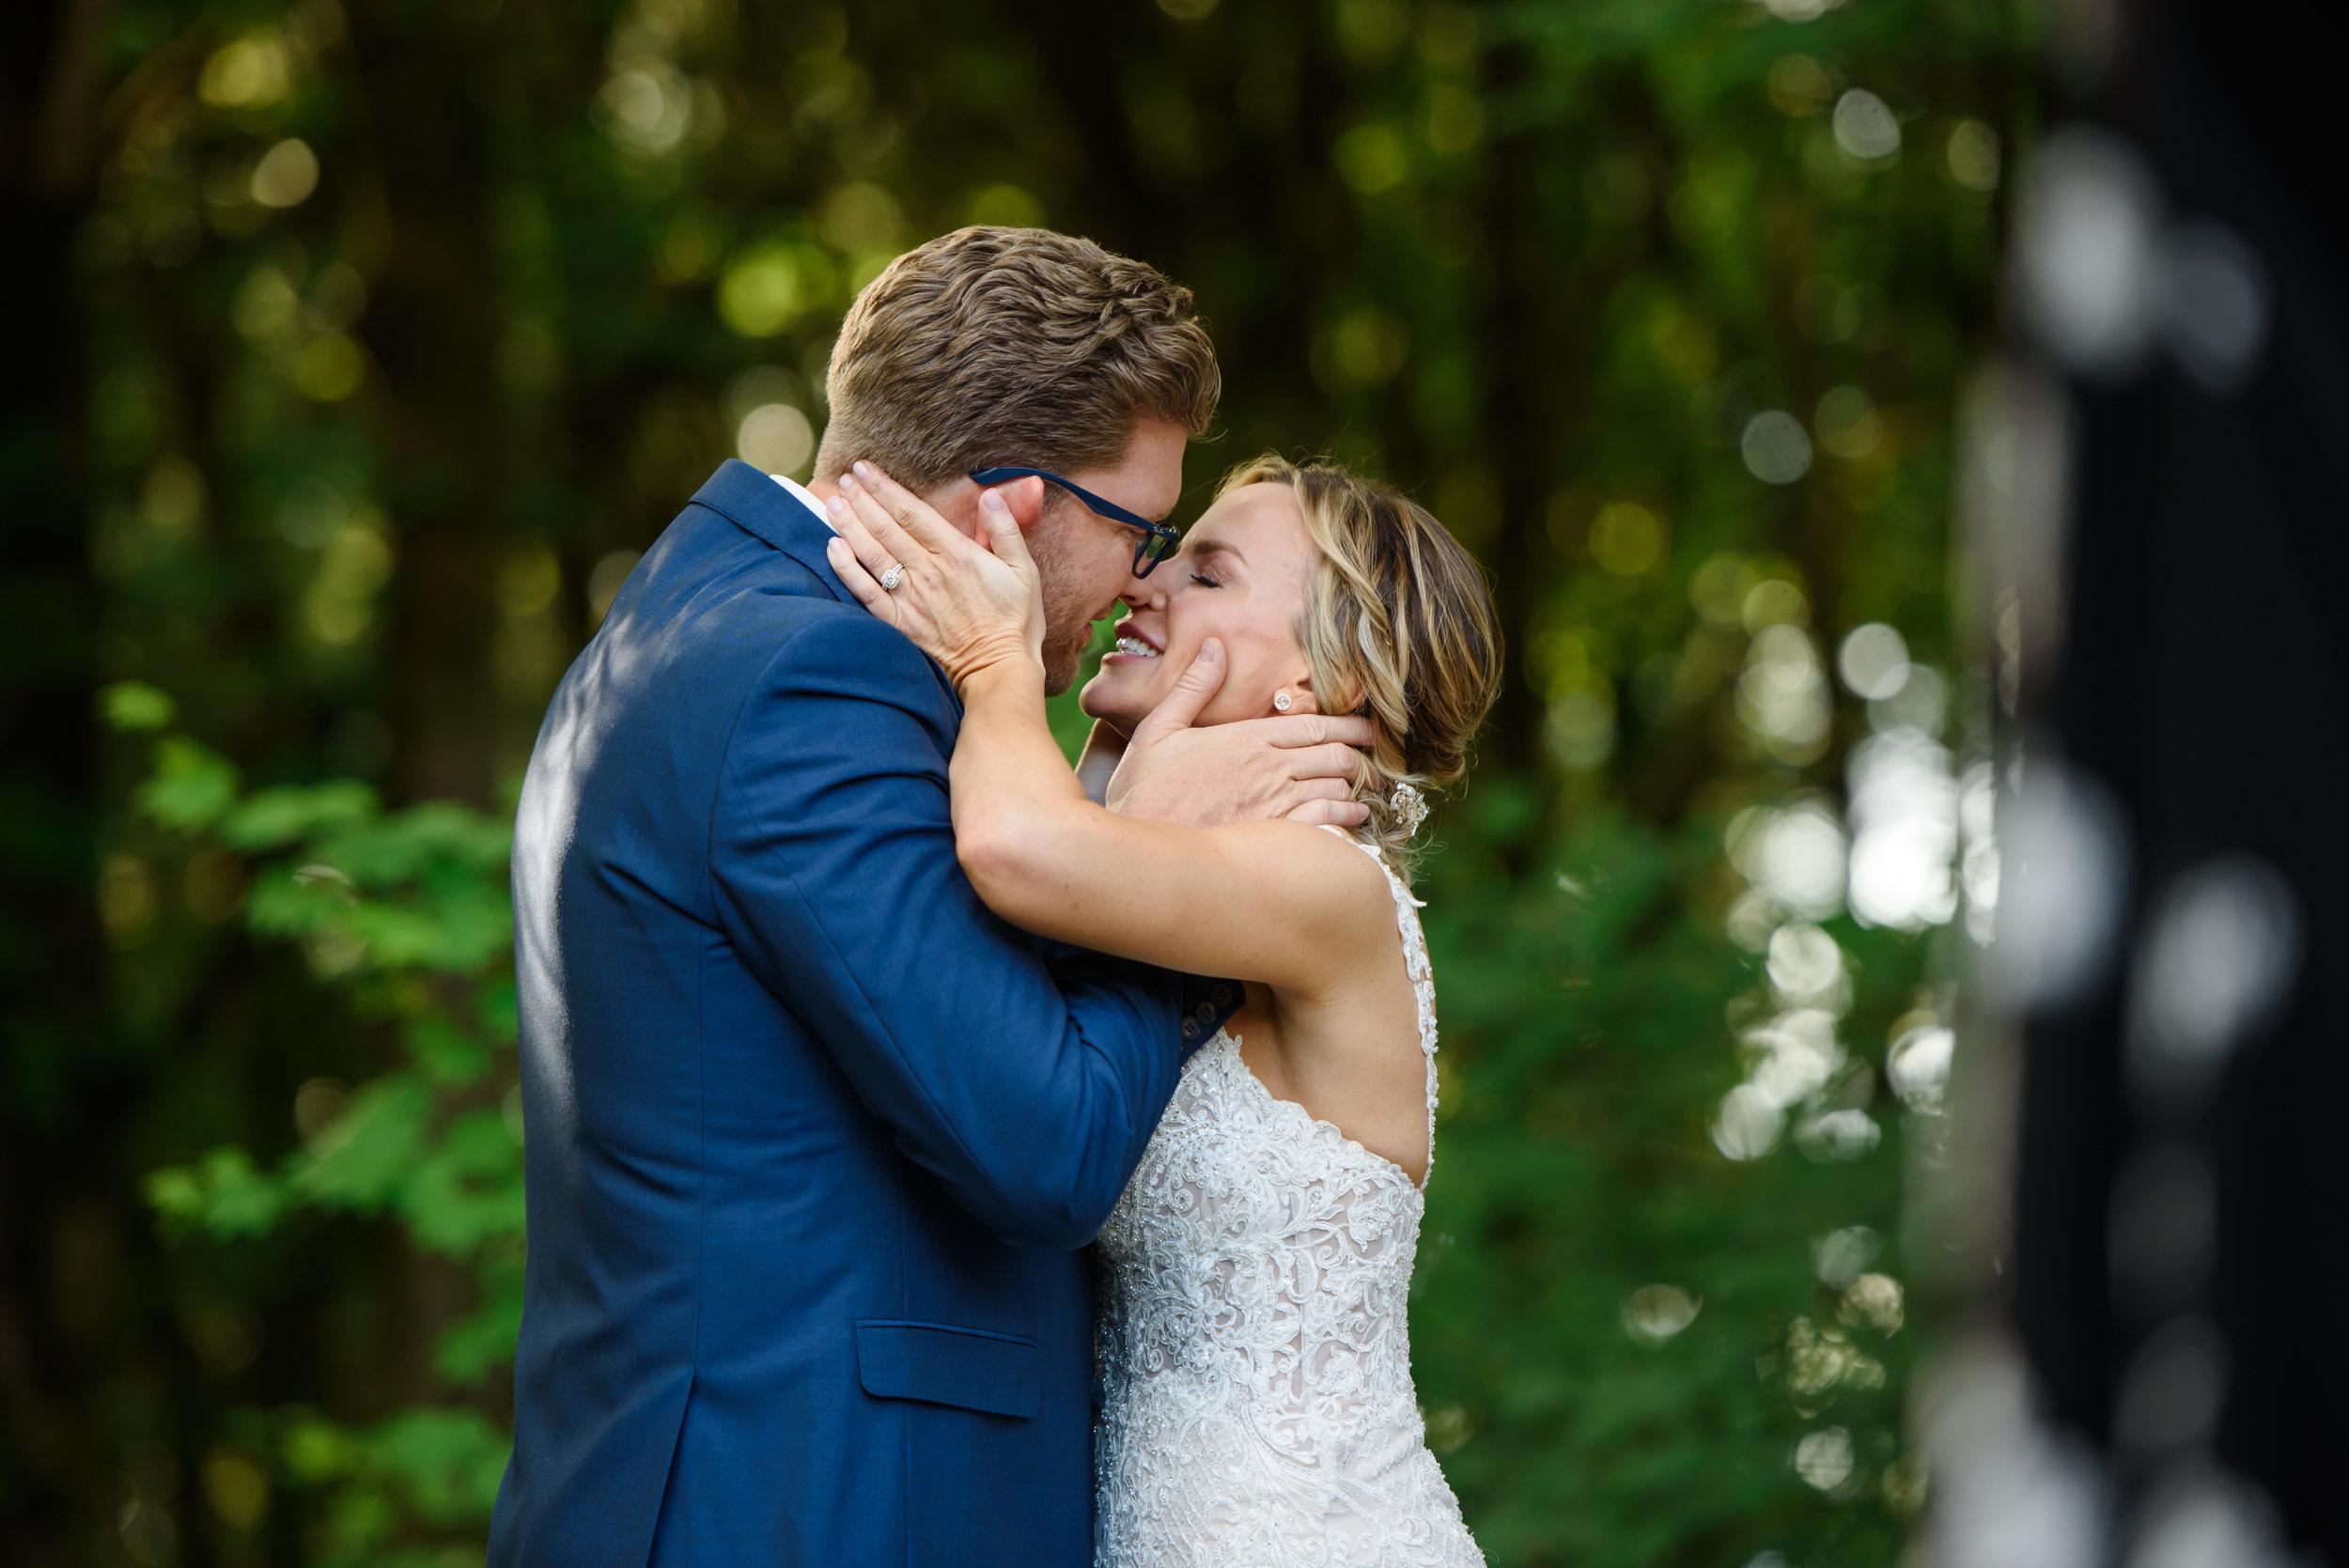 Bridalbliss.com | Portland Seattle Bend Wedding | Oregon Washington Event Planning and Design | Honeysuckle Photography